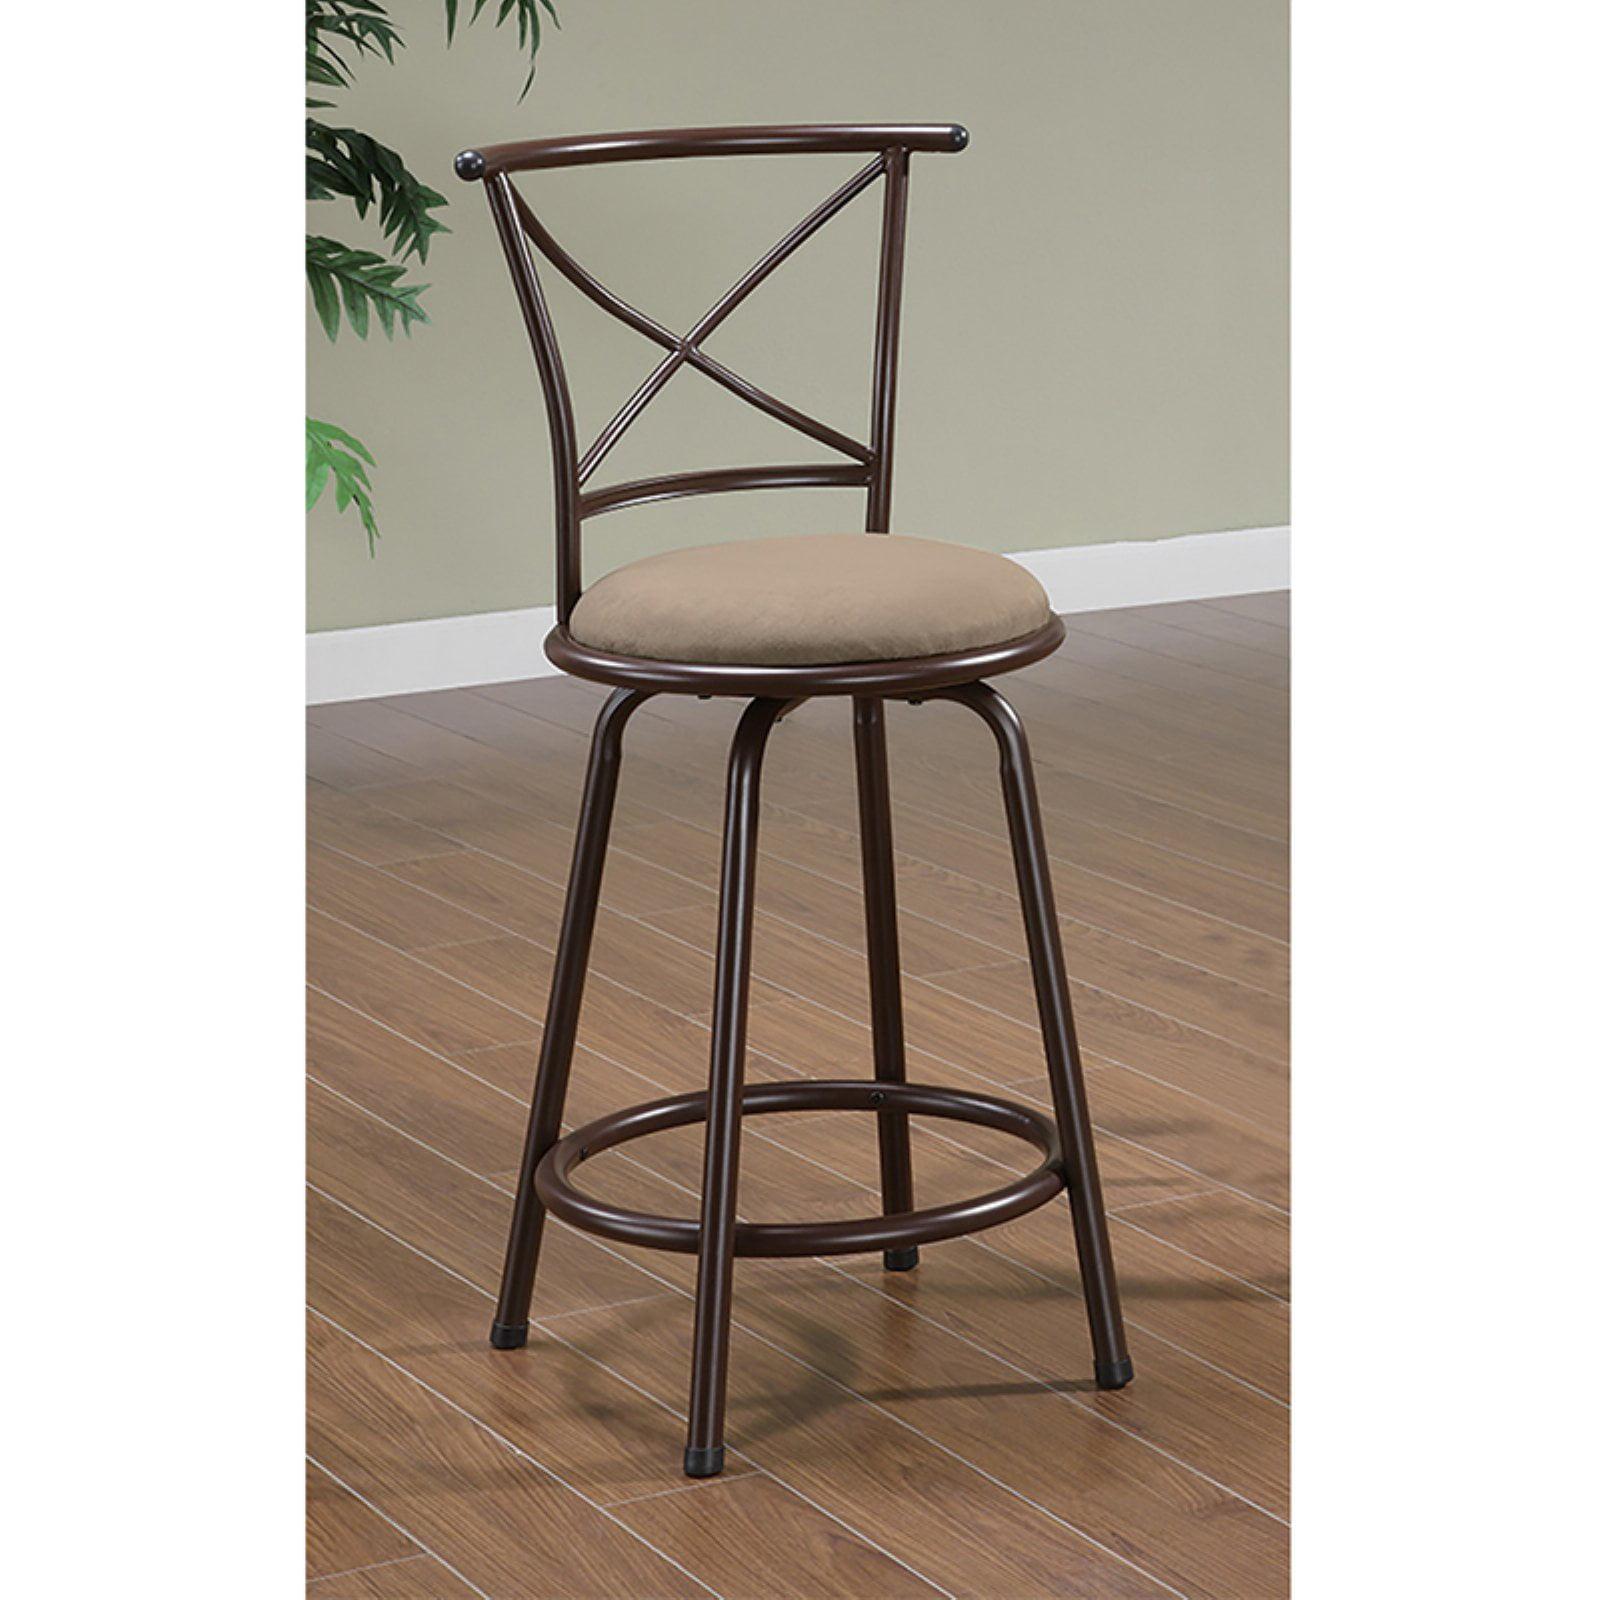 Coaster Furniture 38 in. Cross Back Swivel Bar Stool - Set of 2